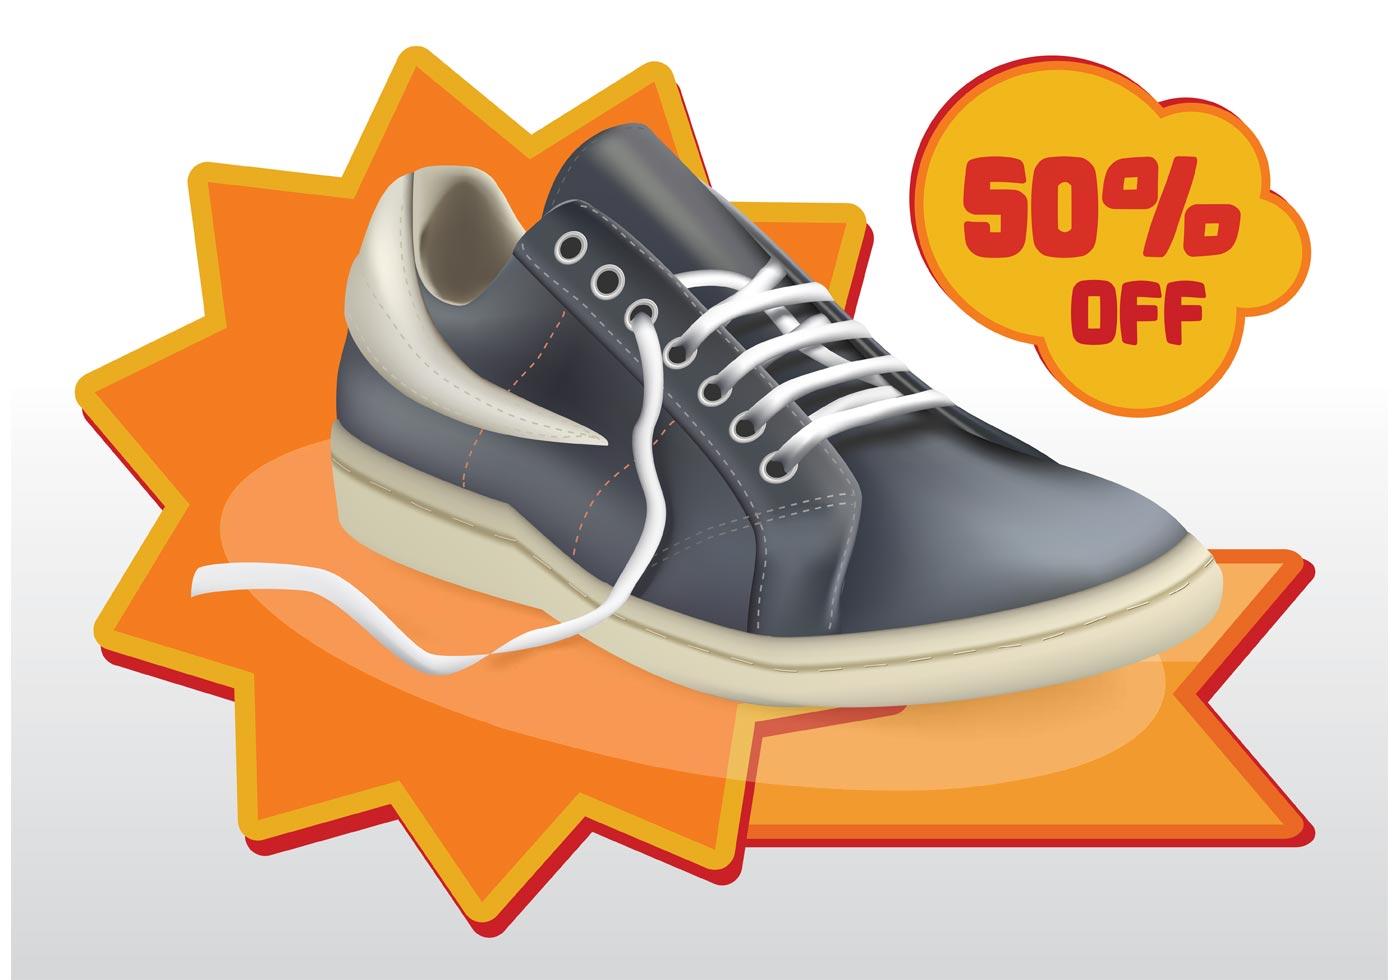 craigslist shoes for sale images